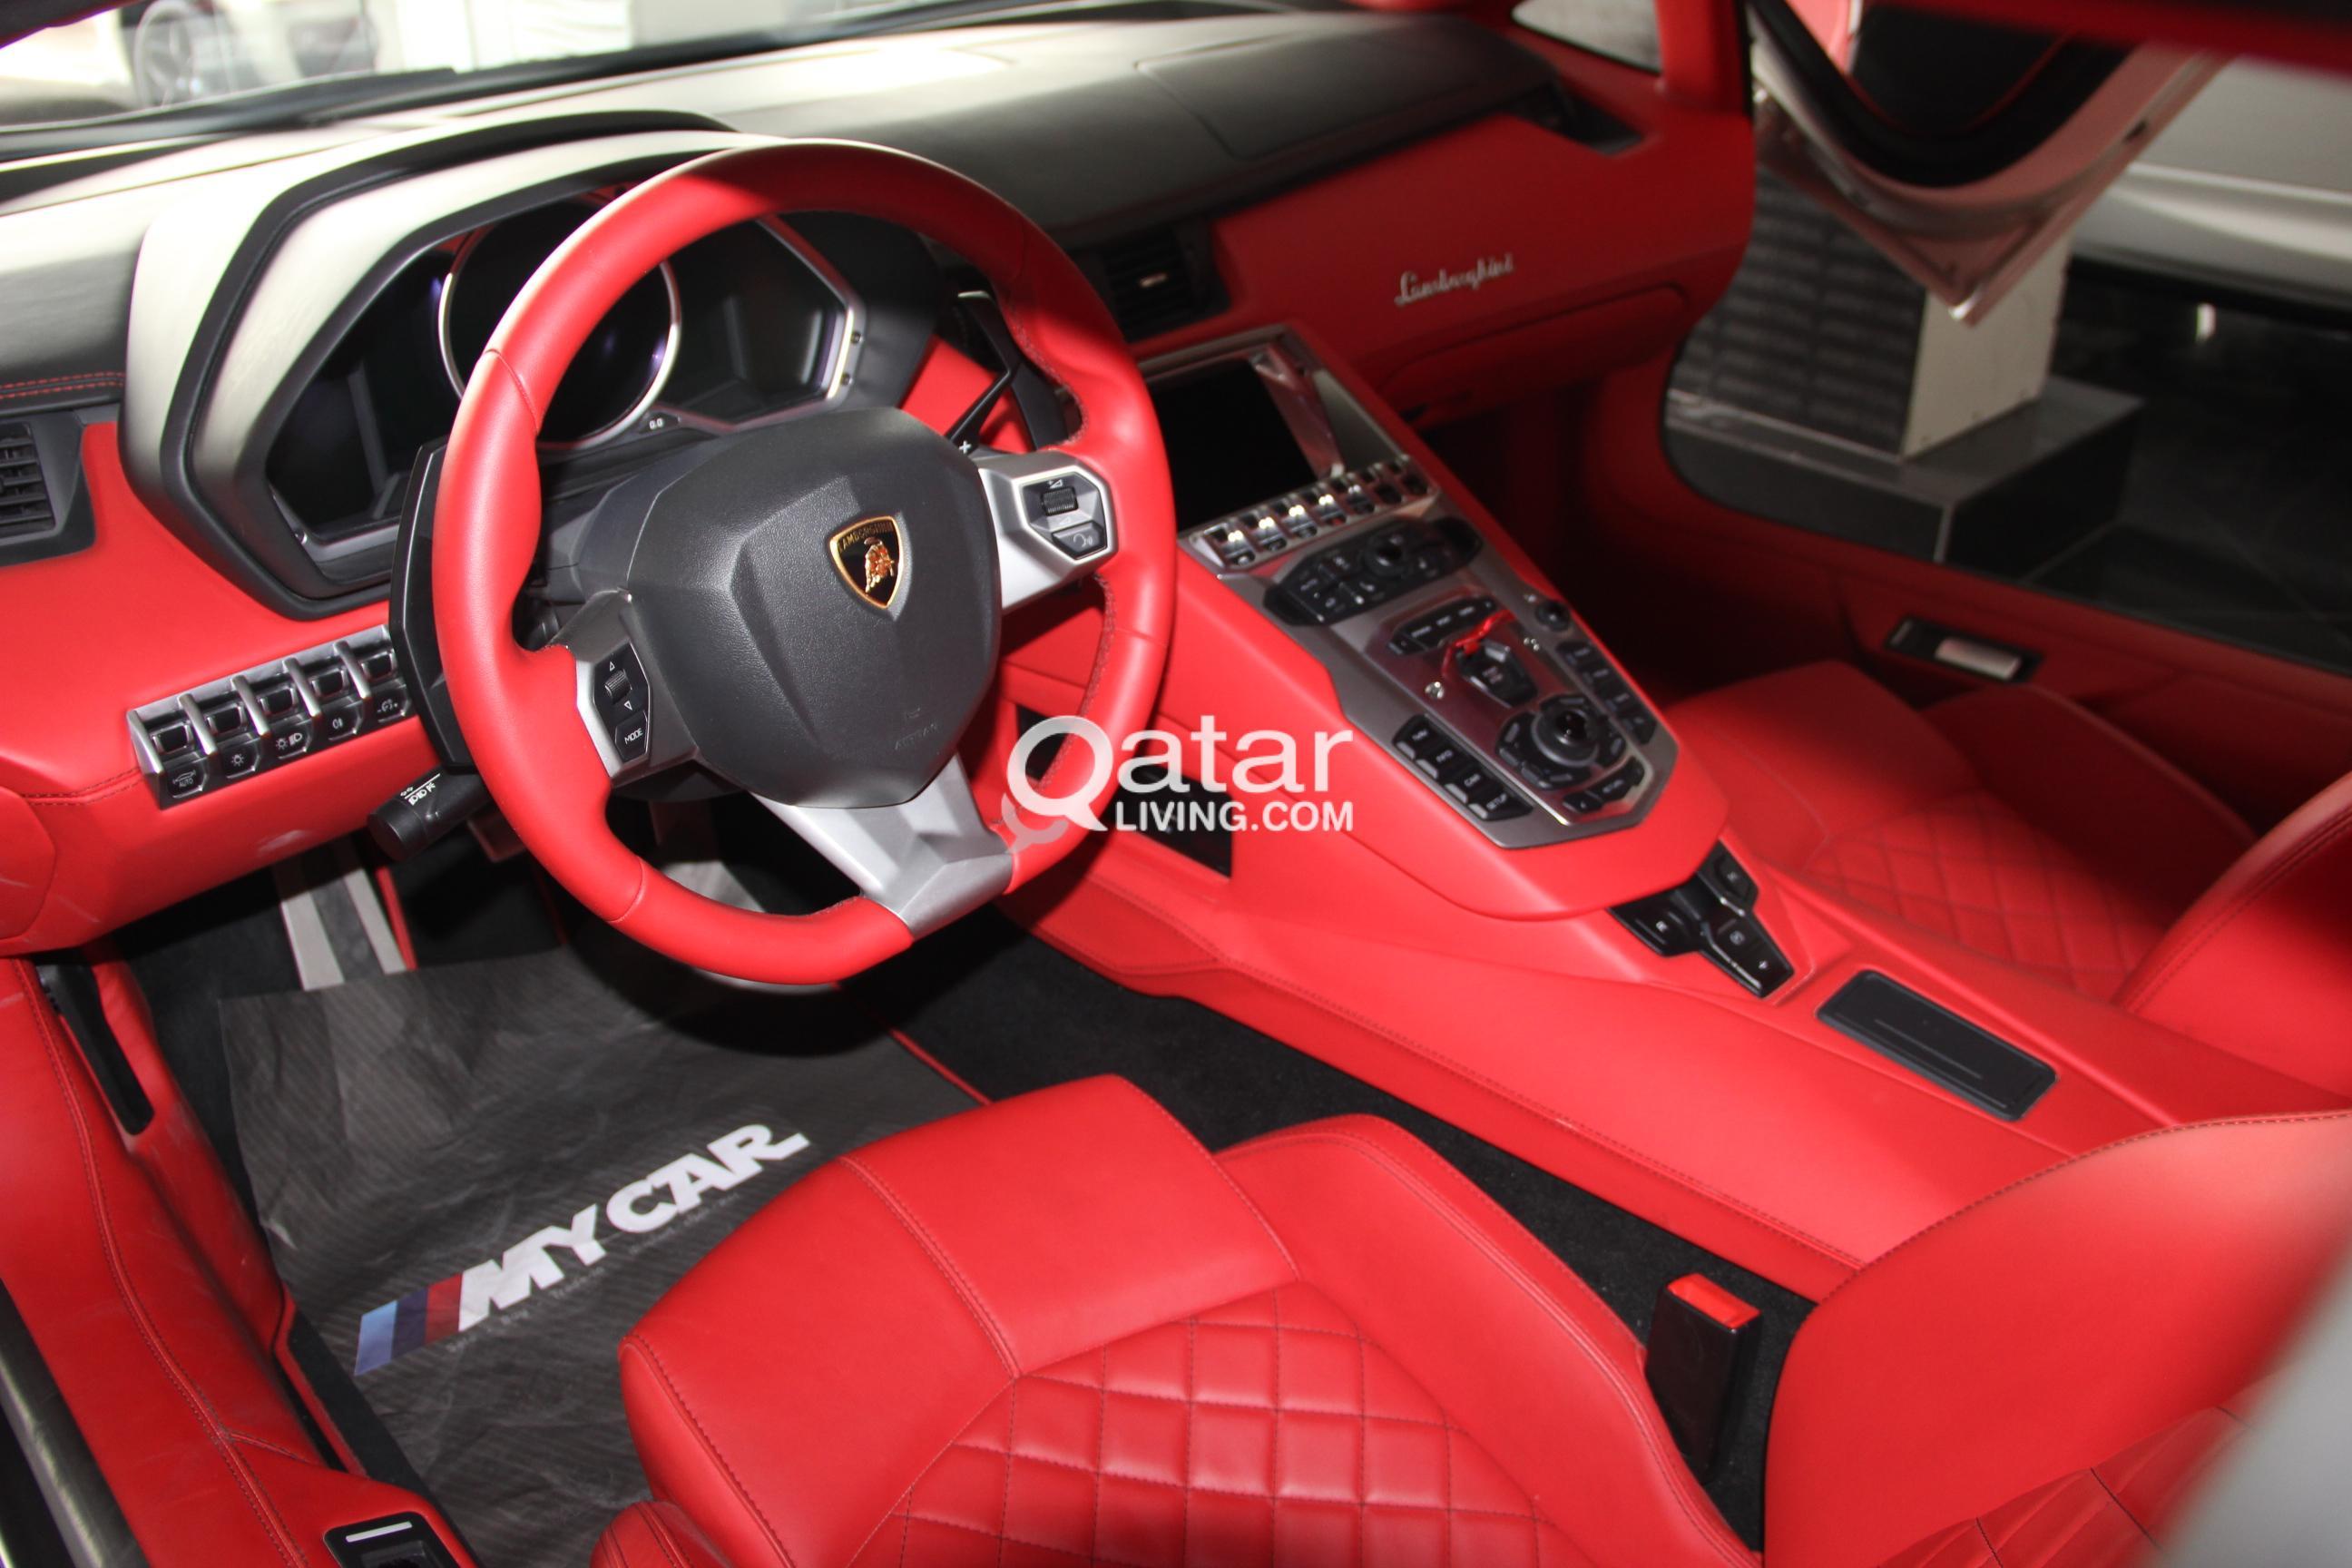 Wonderful Information. Vehicle Make. Lamborghini. Vehicle Model. Aventador. Year  Model. 2015